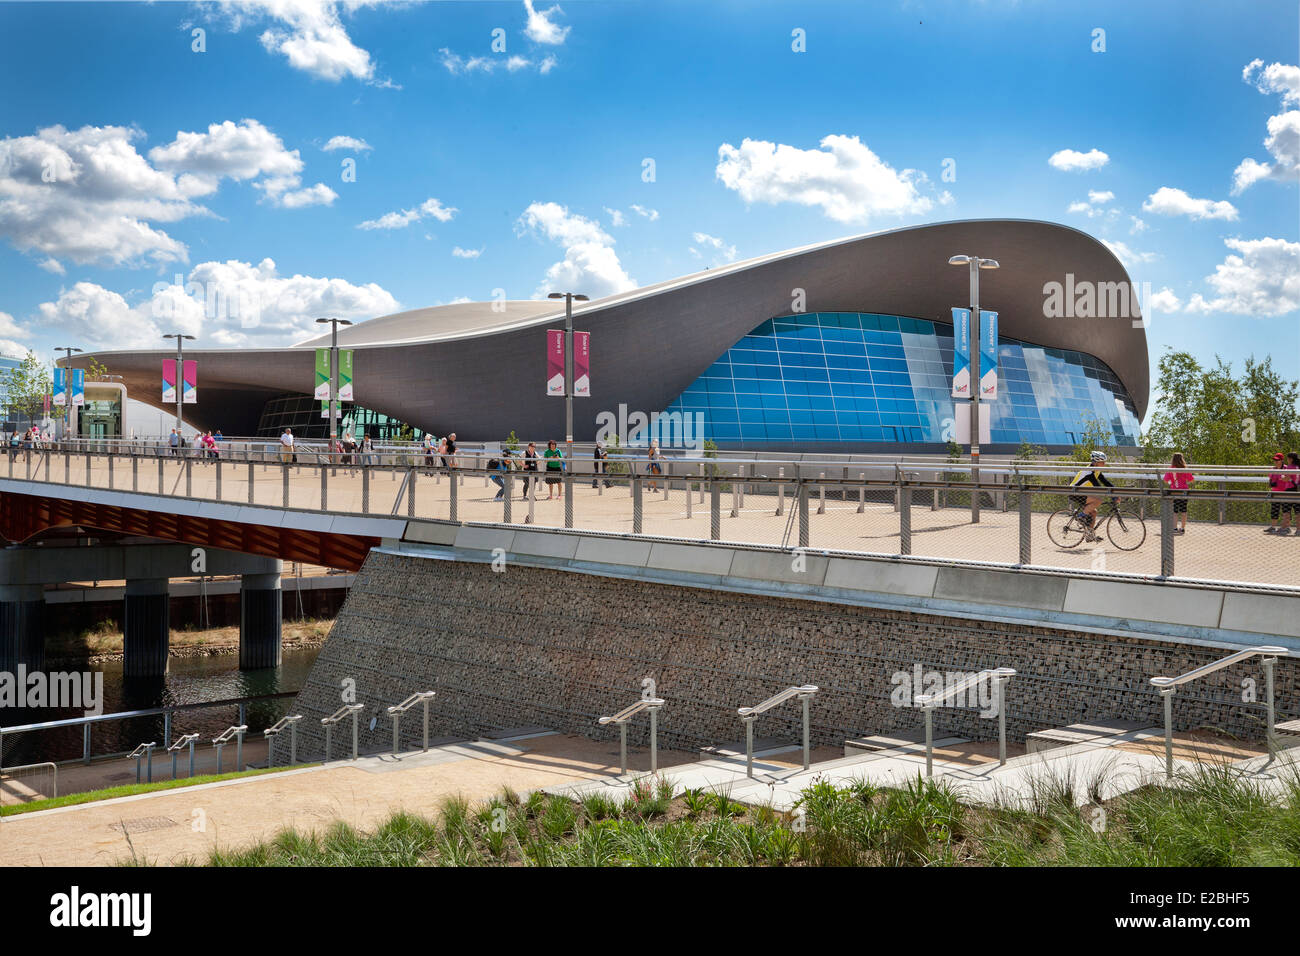 London Aquatics Centre at the Queen Elizabeth Olympic Park. - Stock Image